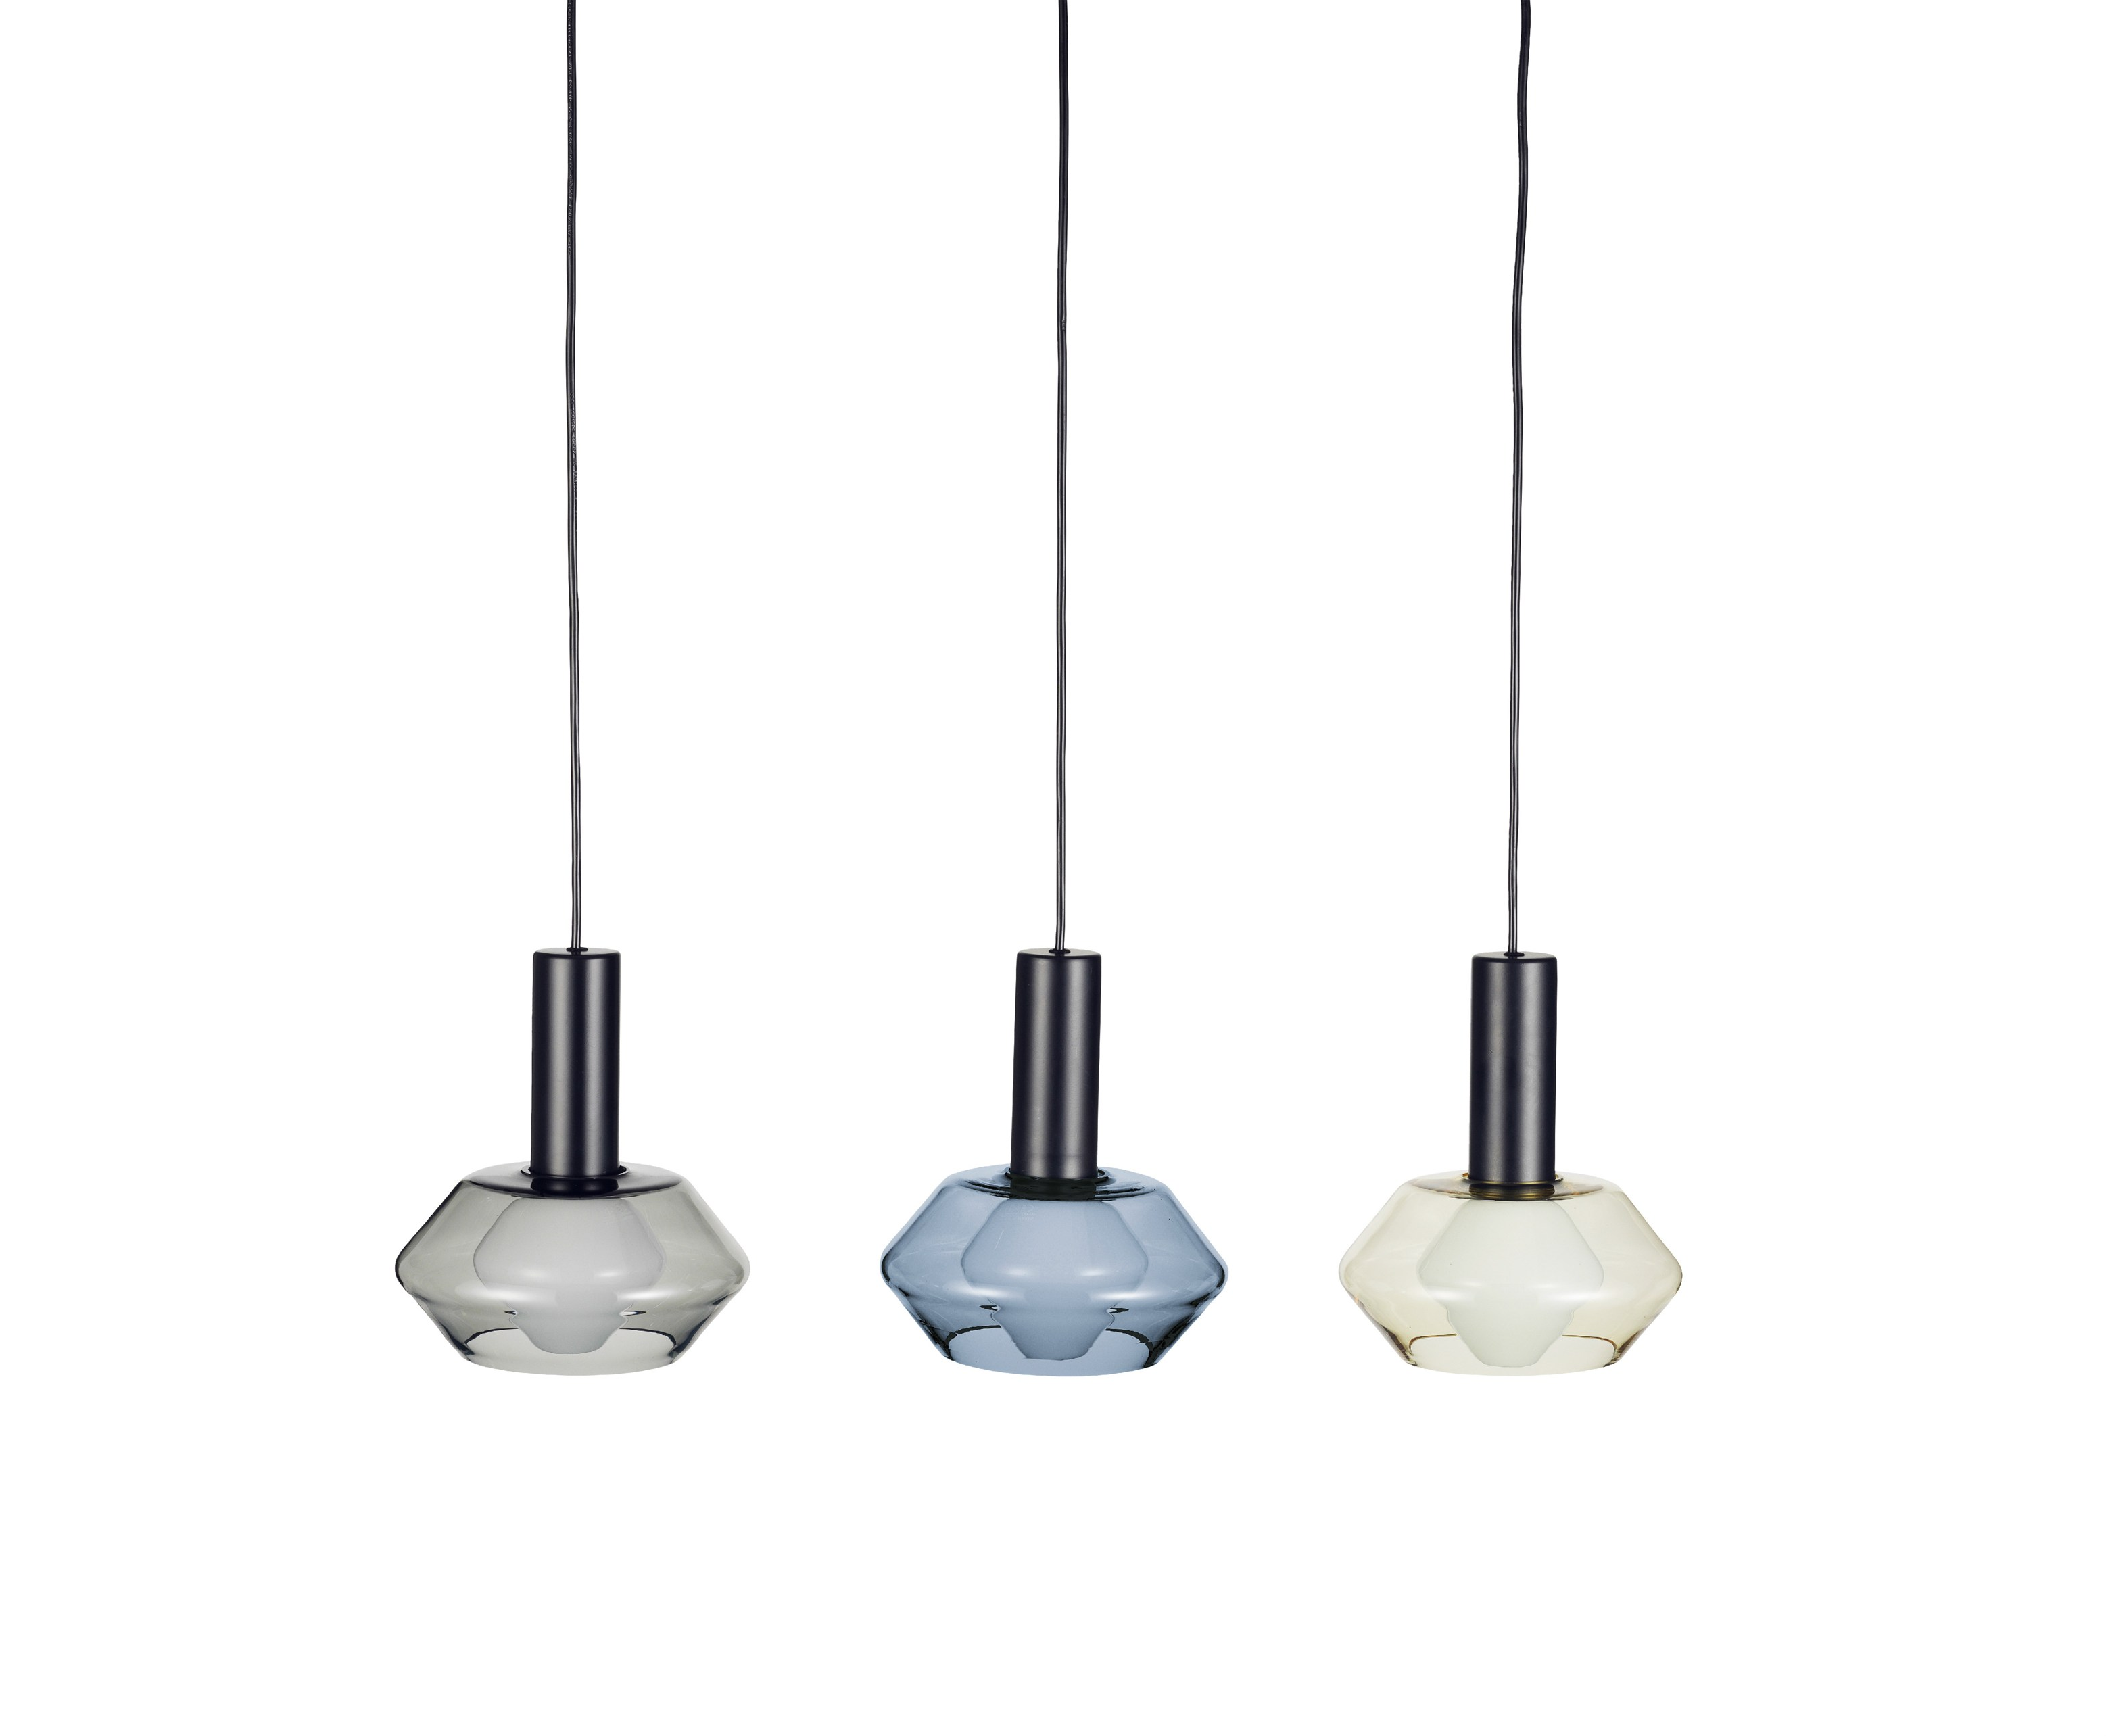 Artek products lighting pendant light a338 - Artek Products Lighting Pendant Light A338 13